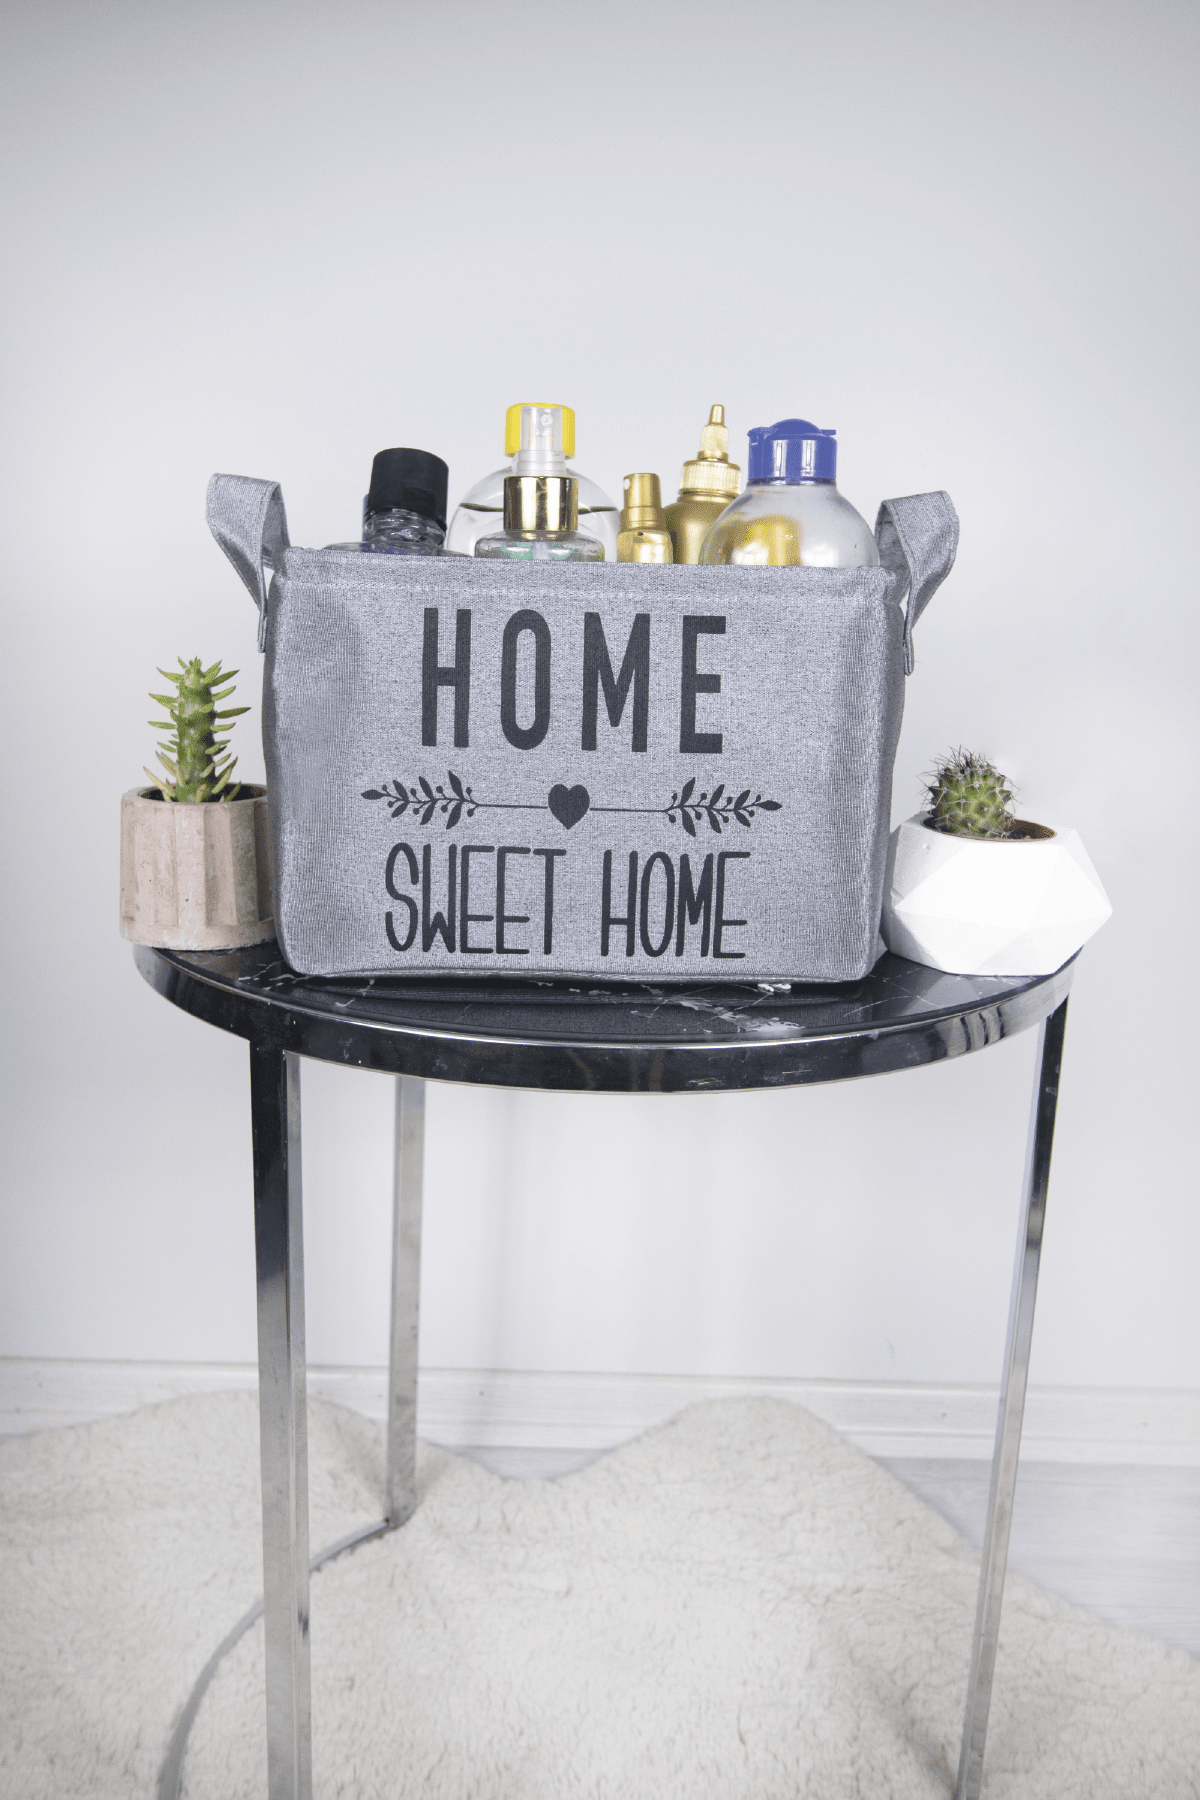 Rope Home Gri Renk Home Sweet Home 6´lı Aile Seti 60-01 Gri 60-01